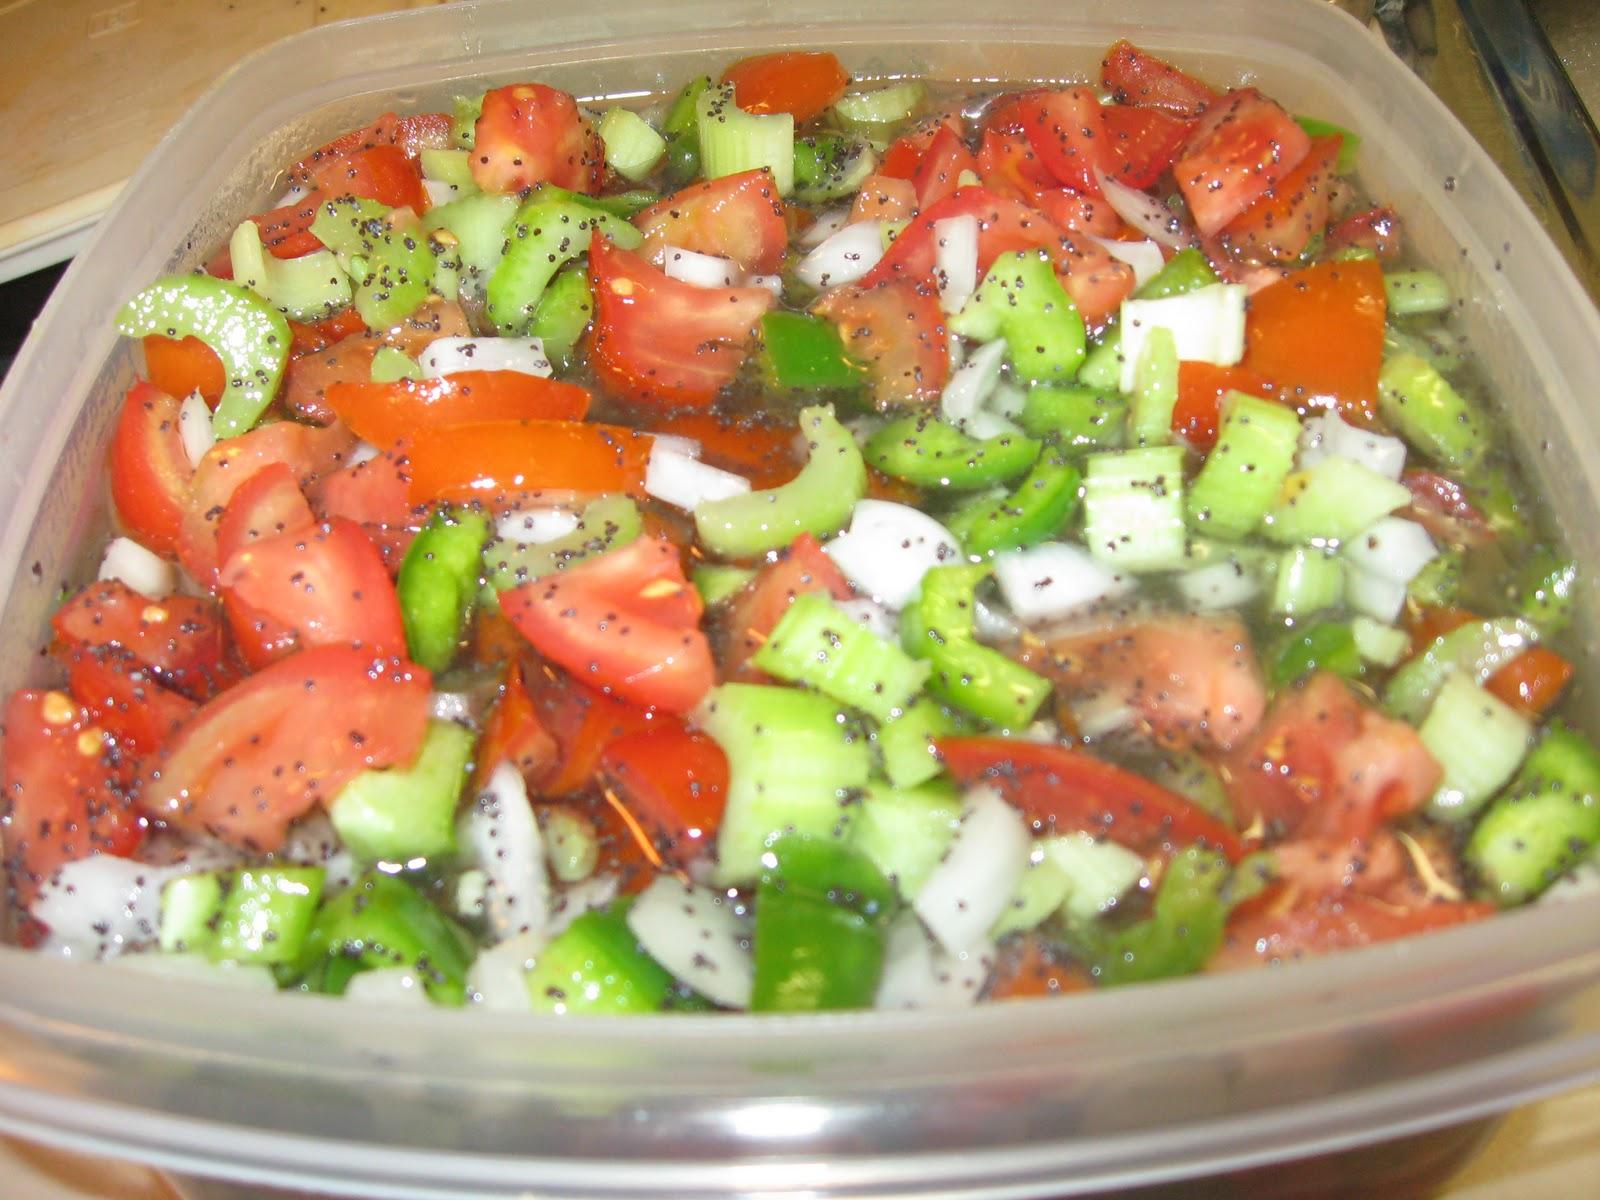 Mom's Kitchen: Marinated Vegetable Salad